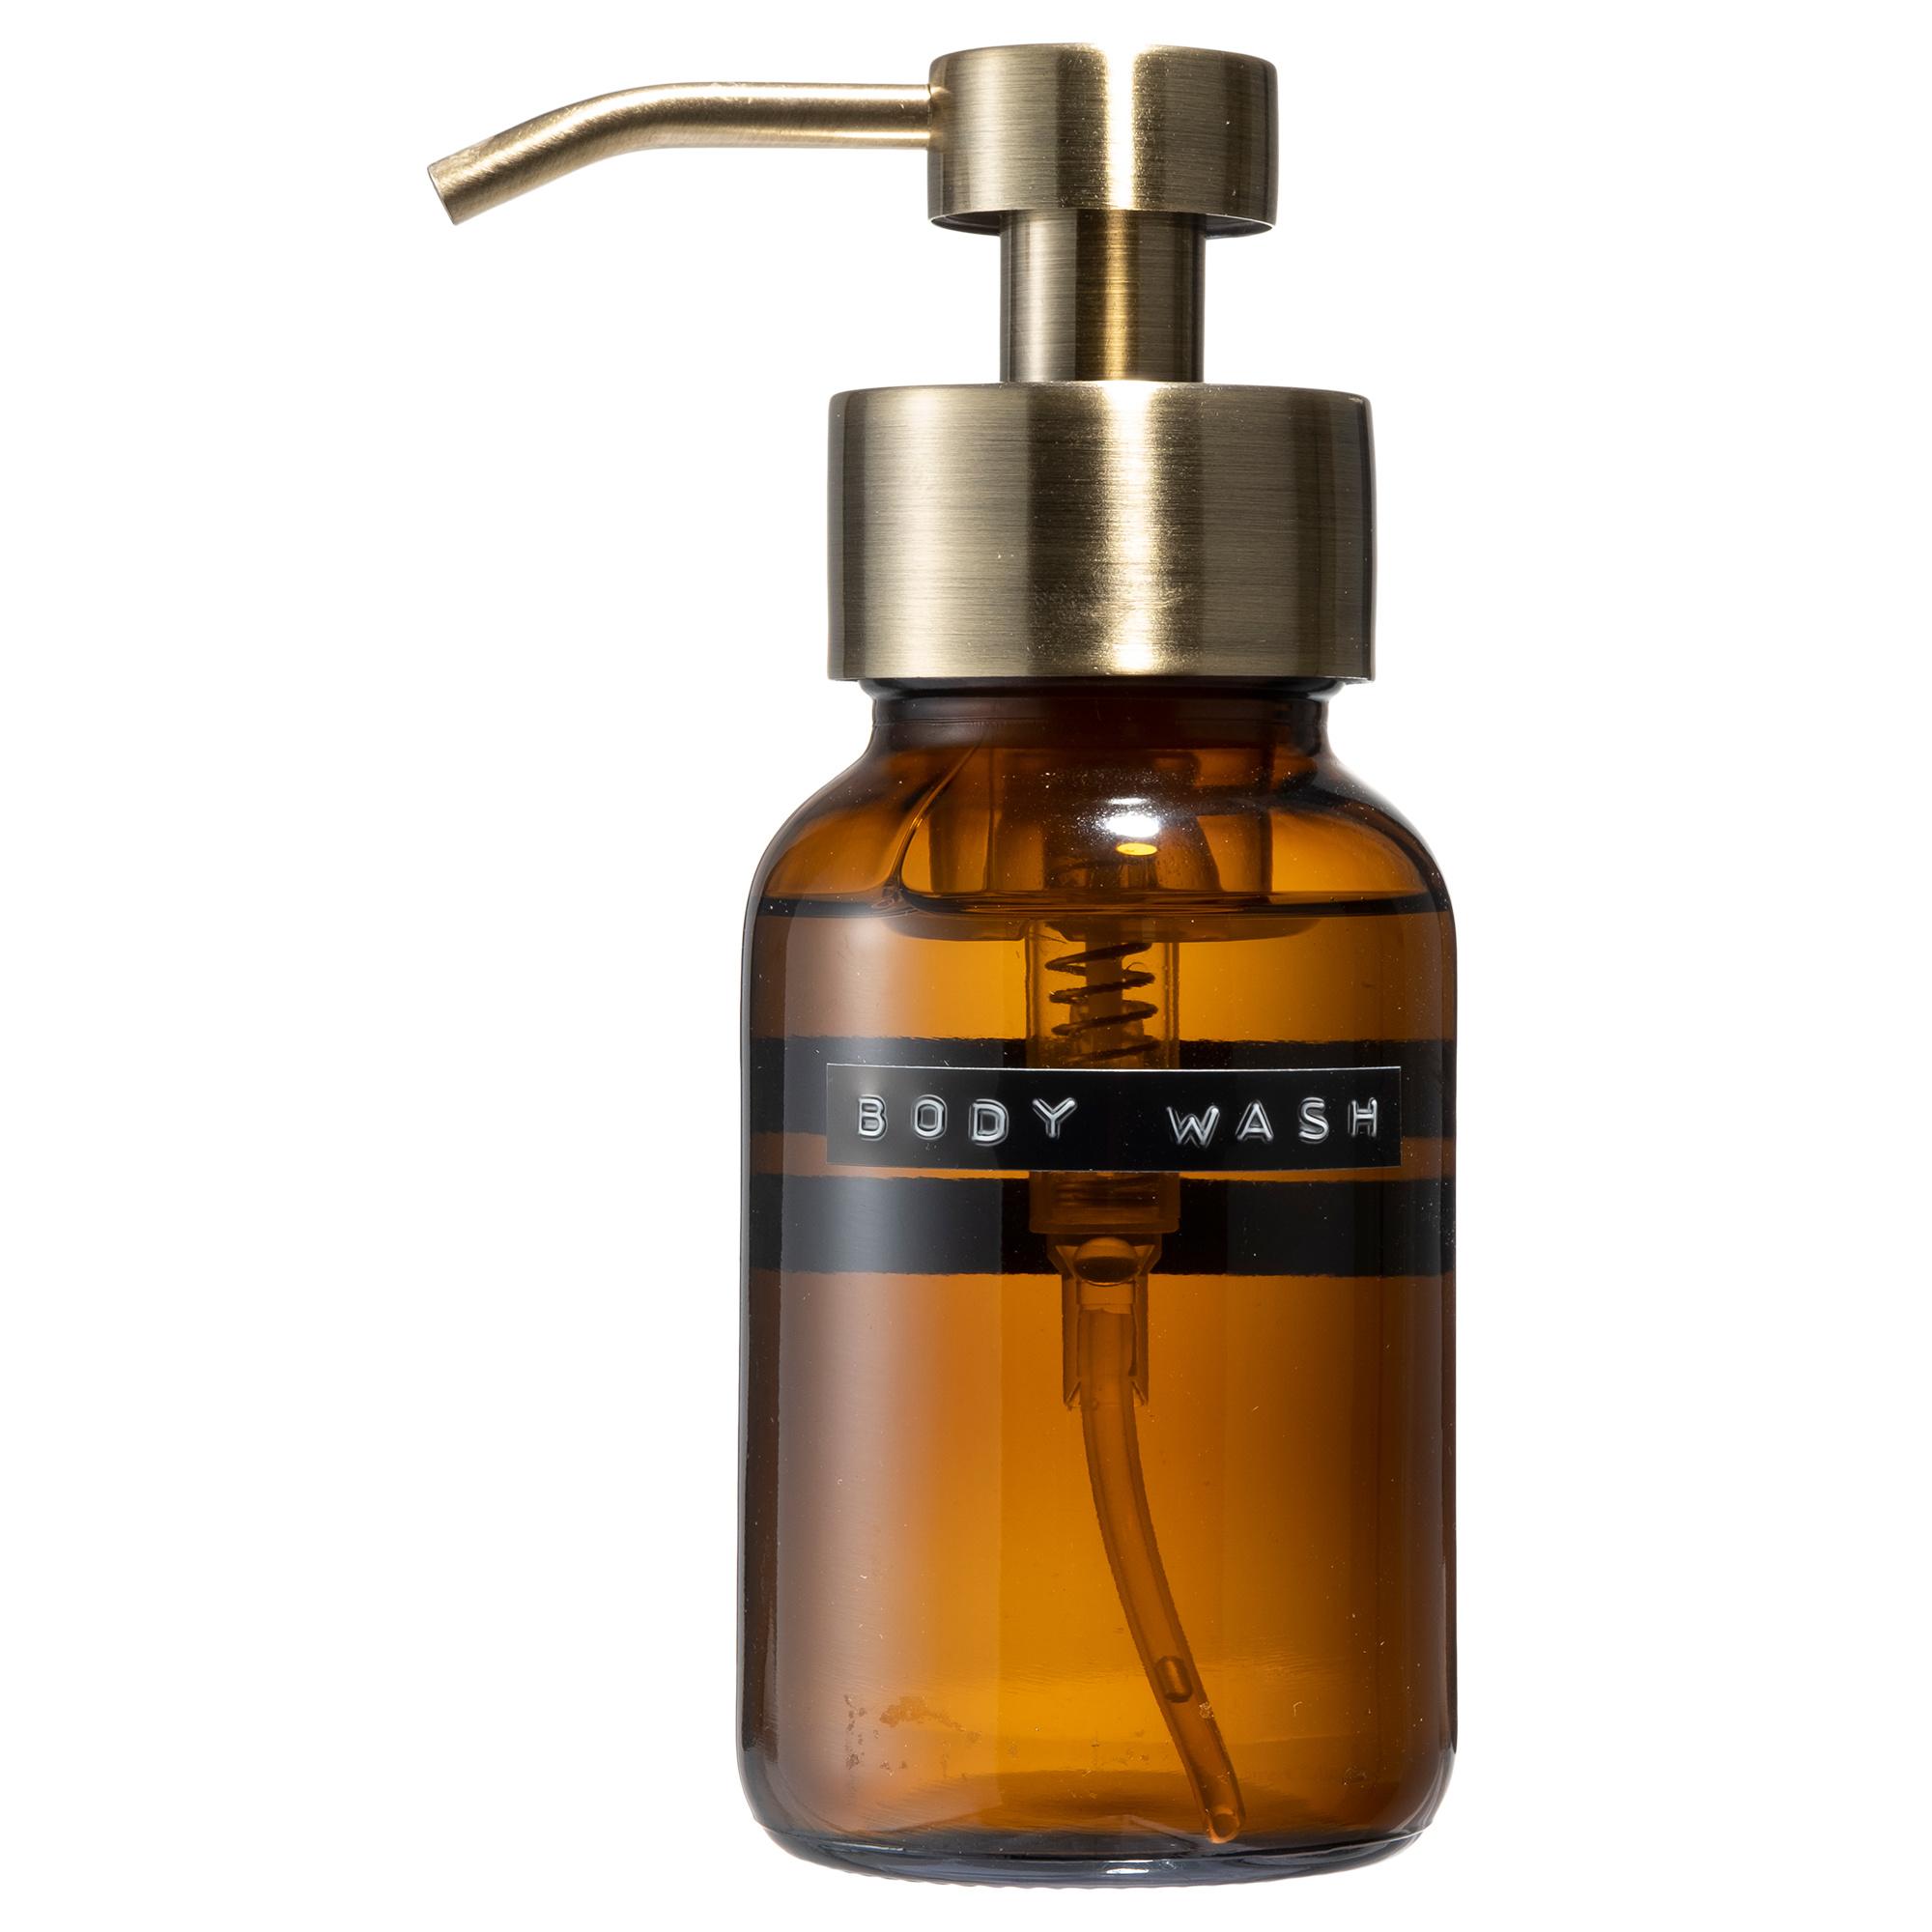 Body wash bruin messing 250ml 'body wash'-1